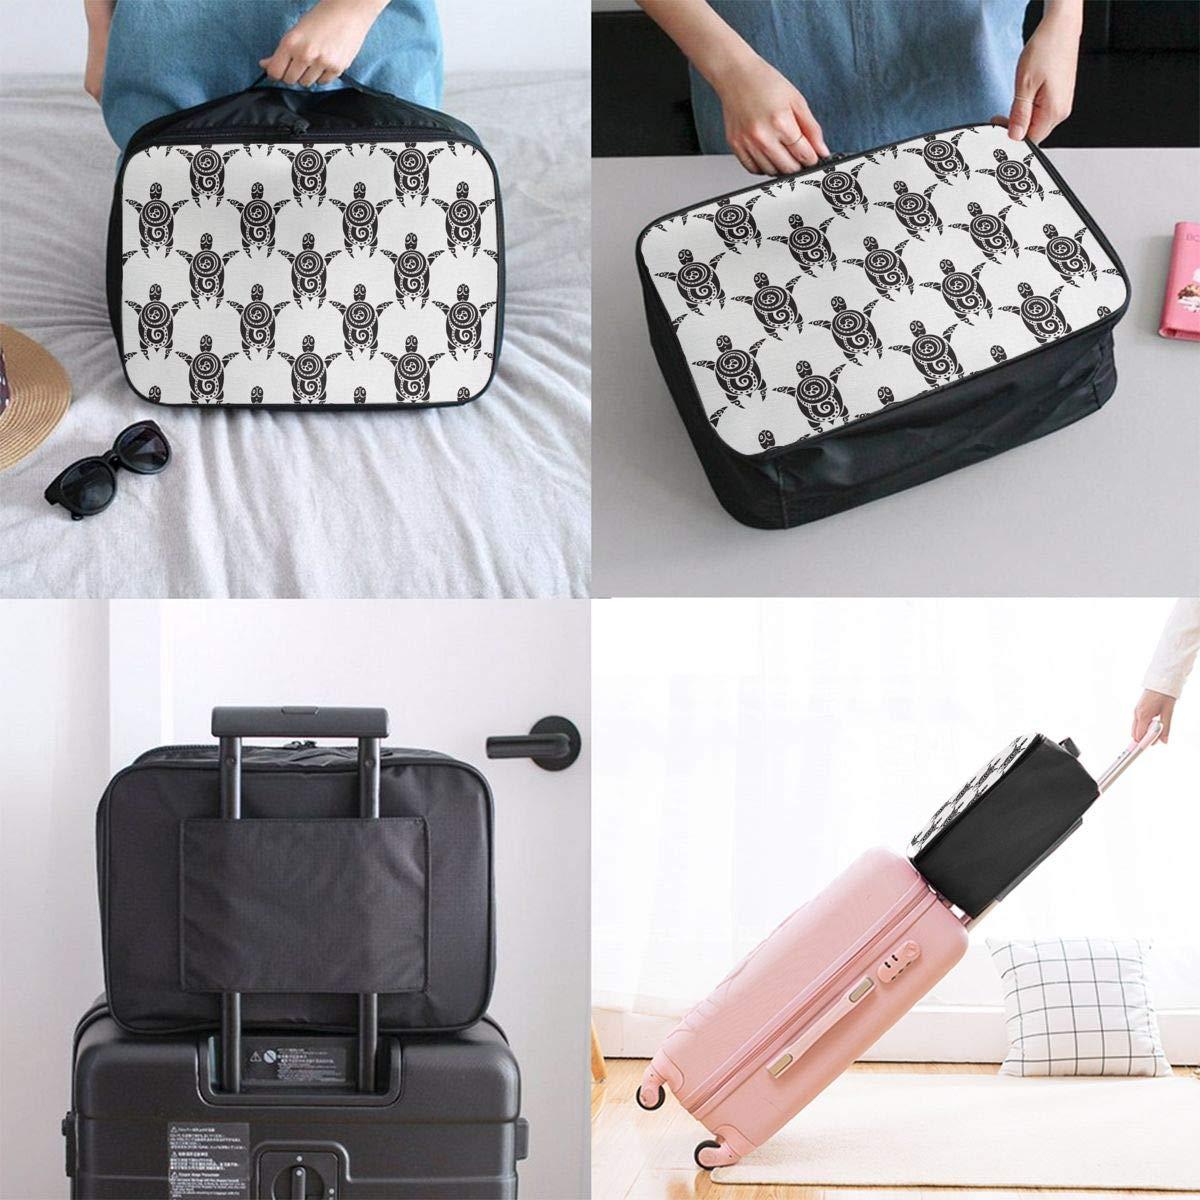 ADGAI Pattern with Sea Turtles Canvas Travel Weekender Bag,Fashion Custom Lightweight Large Capacity Portable Luggage Bag,Suitcase Trolley Bag